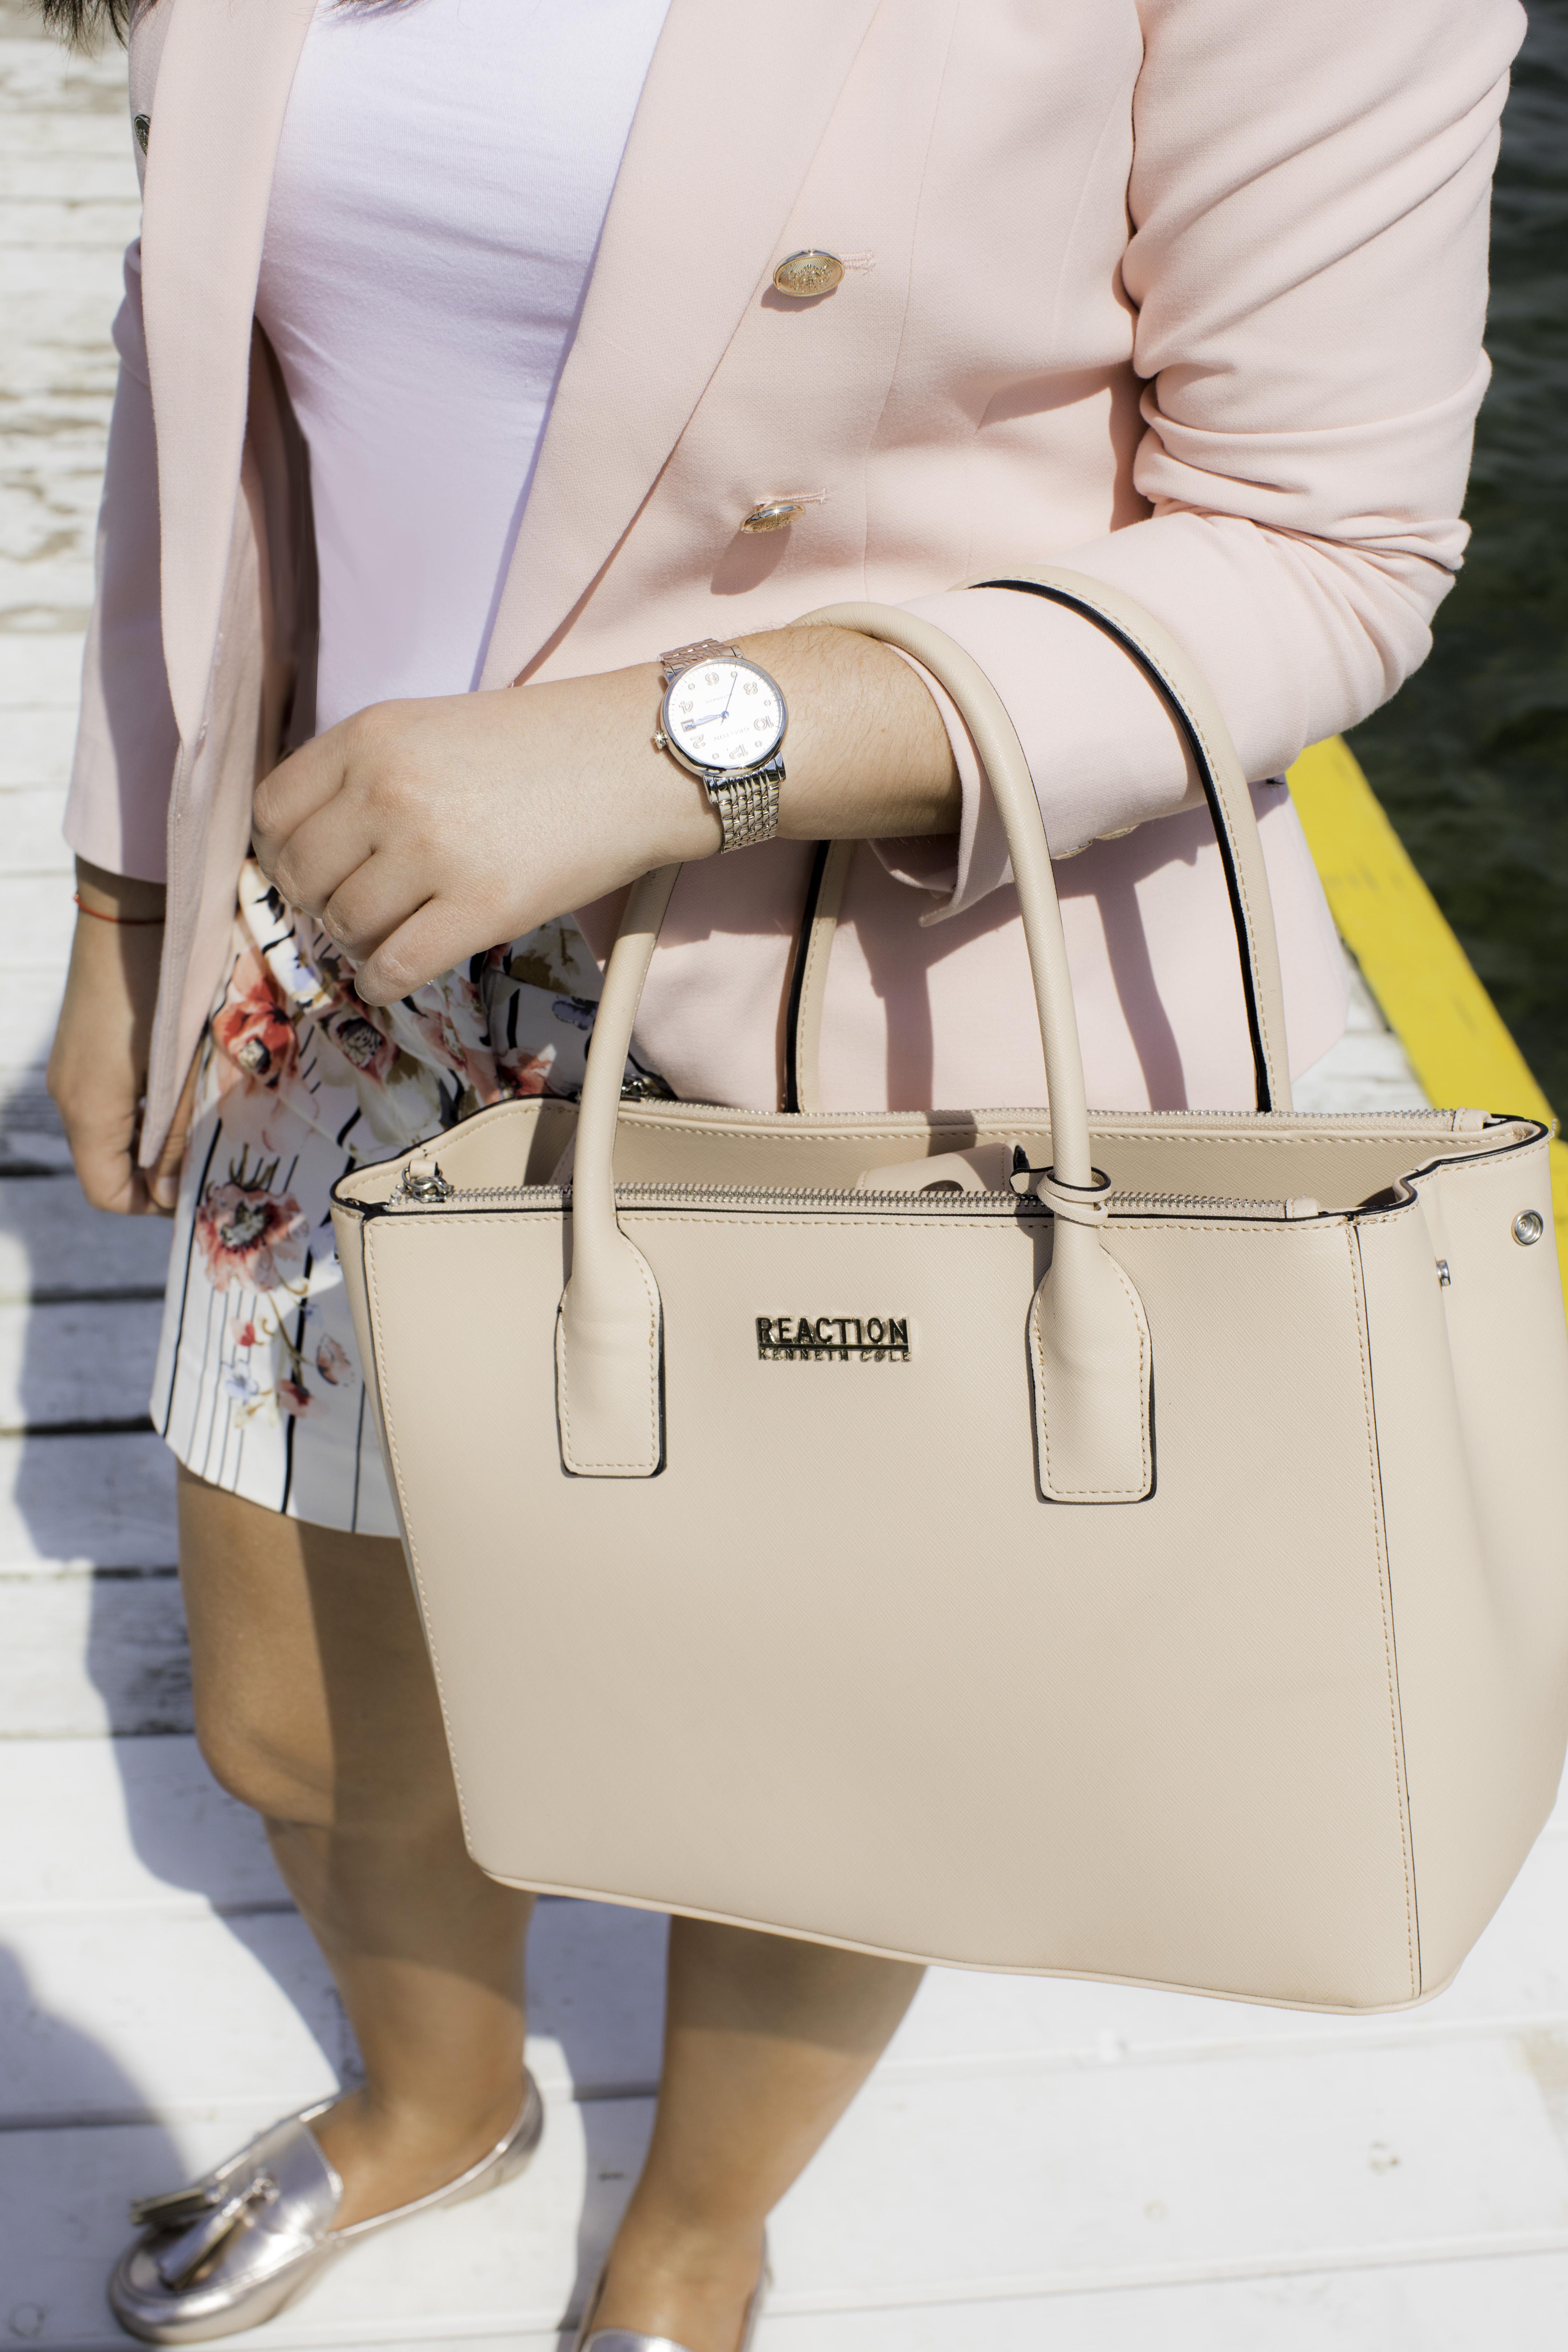 grayton watch, luxury watch, designer watches, white house black market boating outfit, pink blazer,